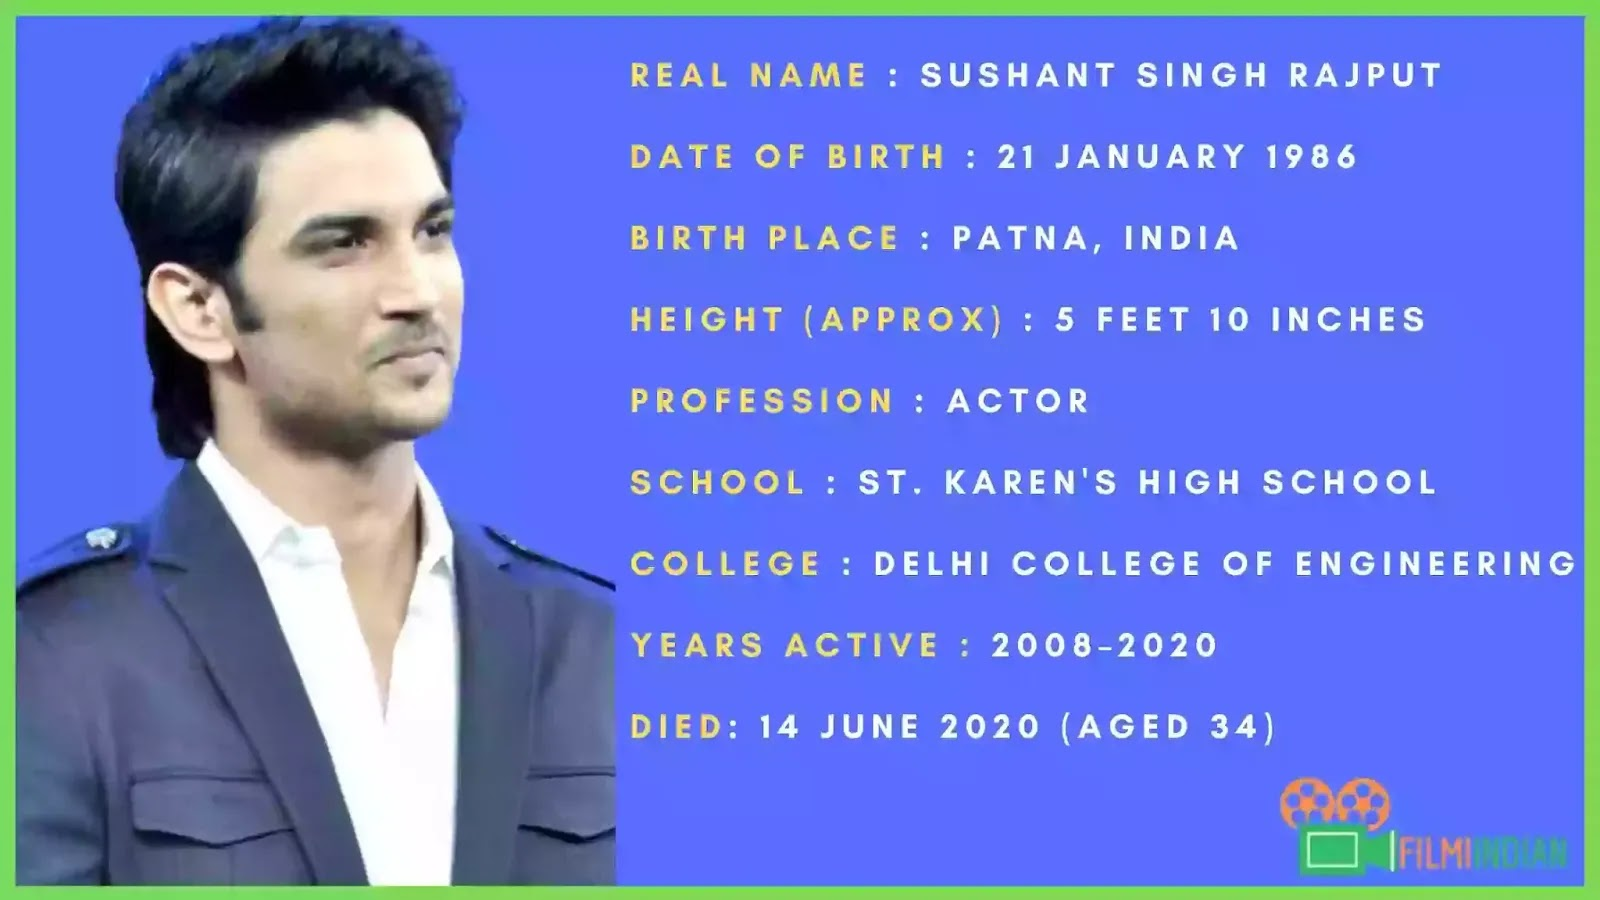 Sushant Singh Rajput : Died June 2020 : Best Actor : Life Story